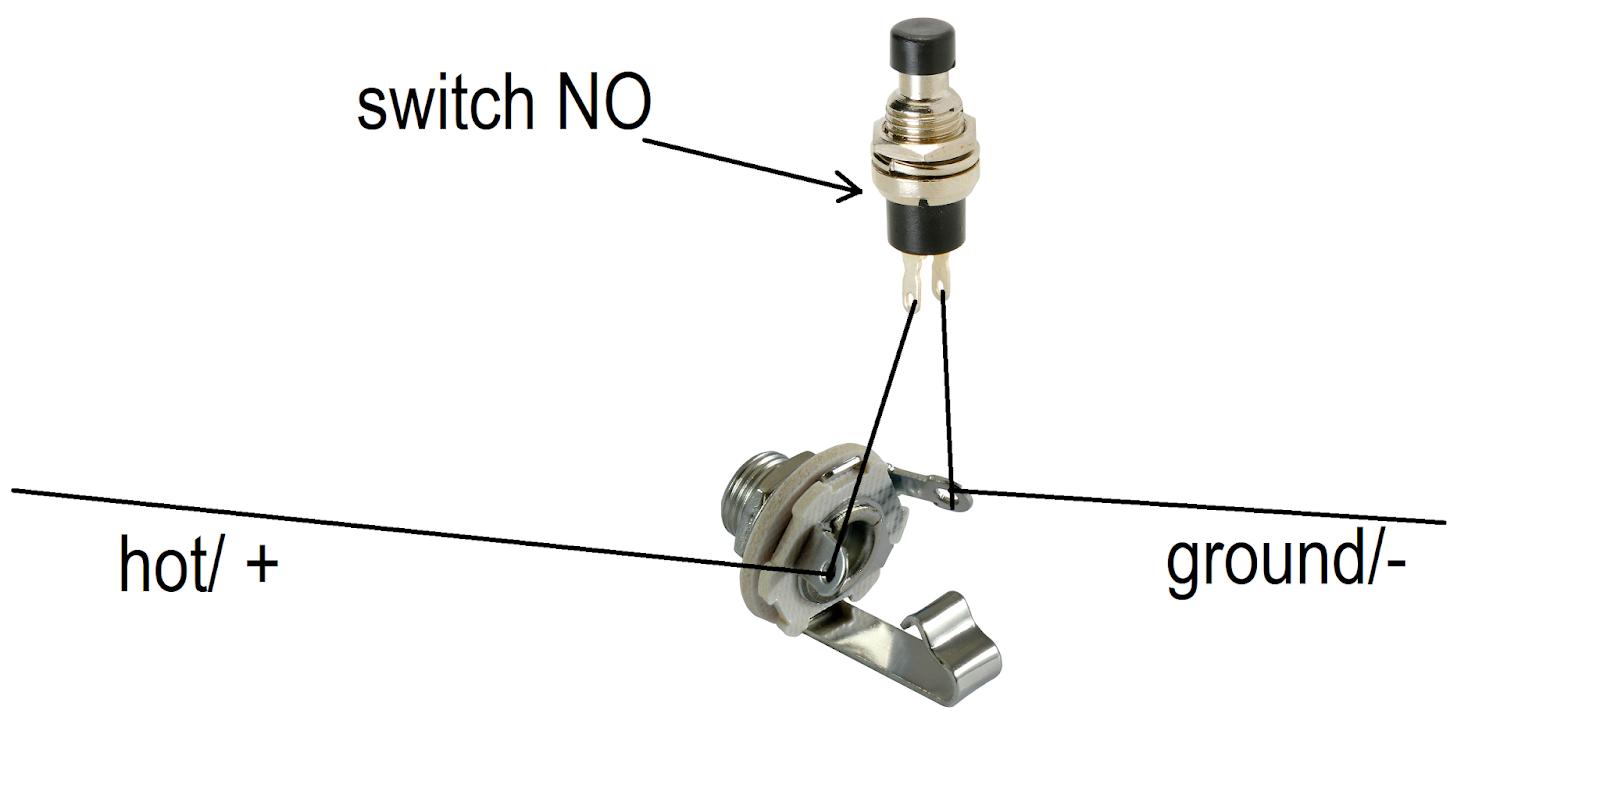 Wiring Kill Switch No Wiring Kill Switch Toggle Sedangkan